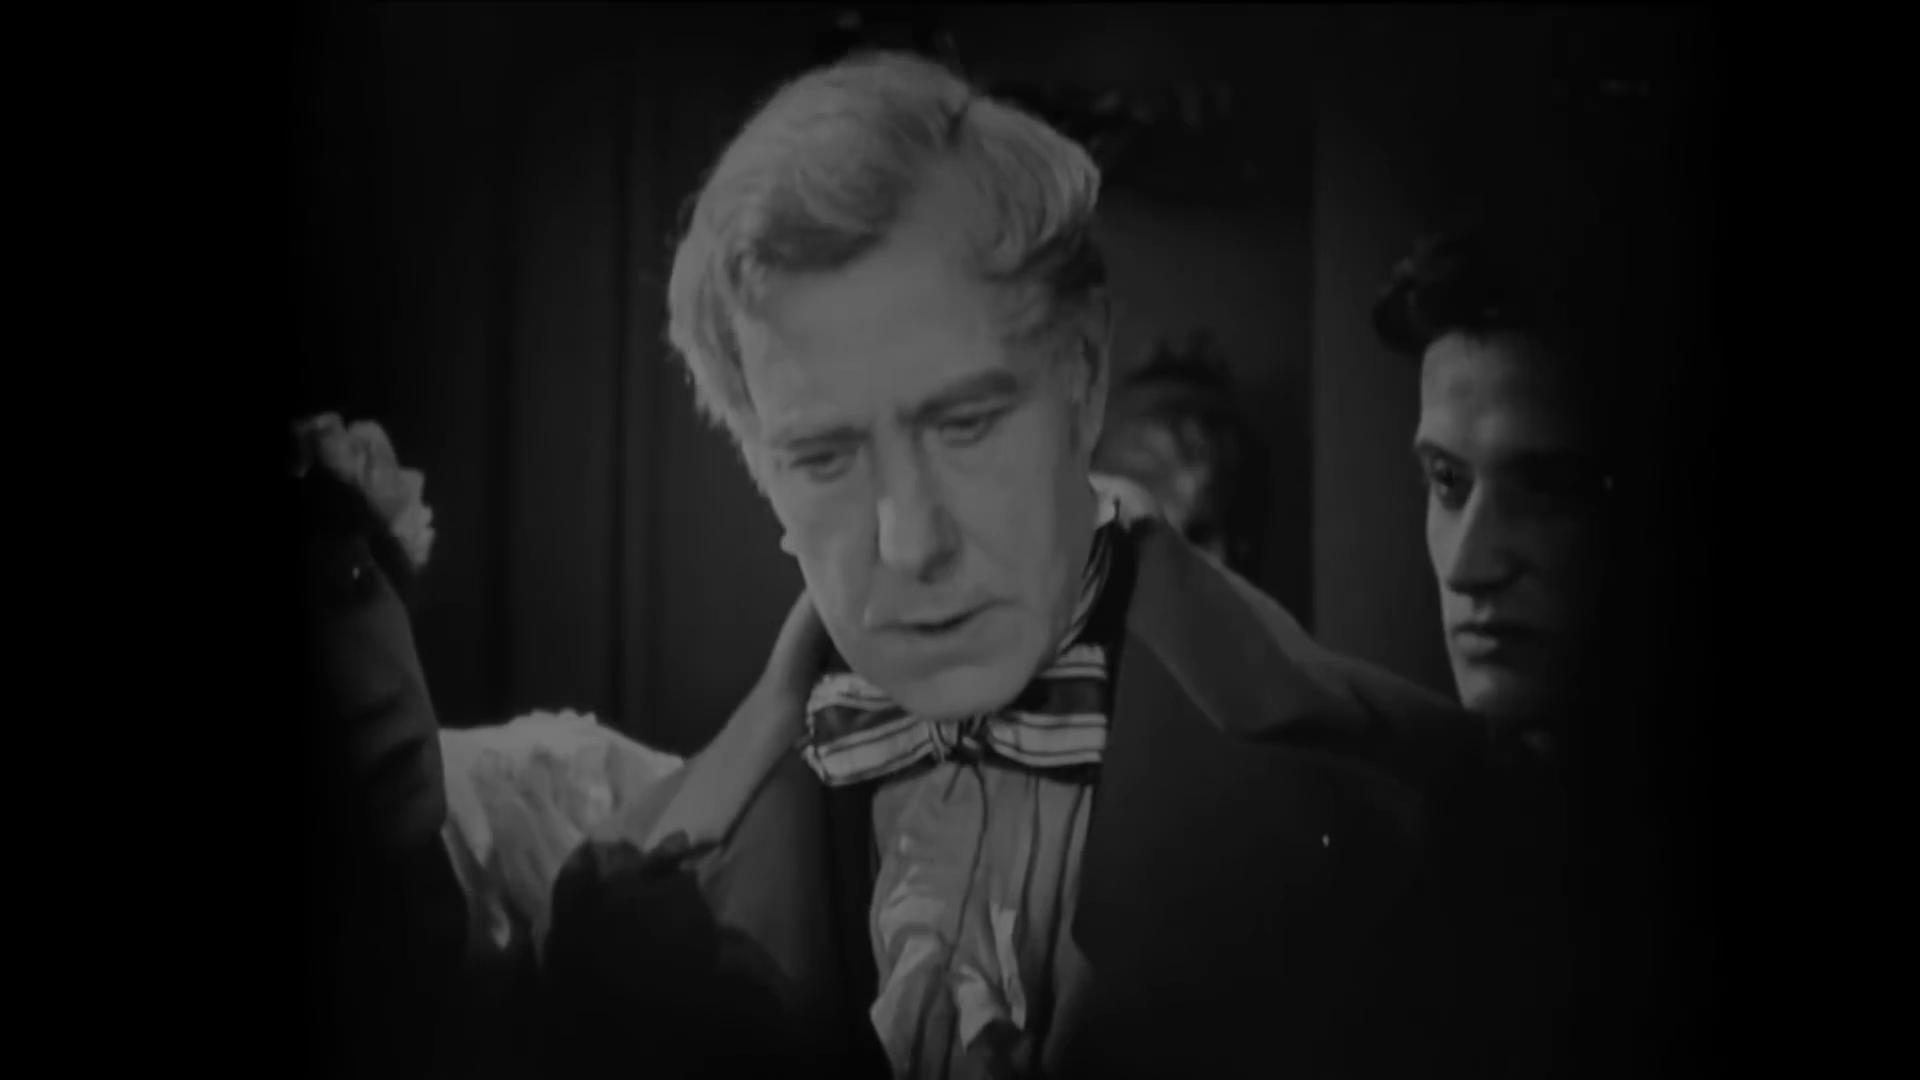 George Stevens dans le film Dr. Jekyll and Mr. Hyde (Docteur Jekyll et M. Hyde, 1920) de John S. Robertson